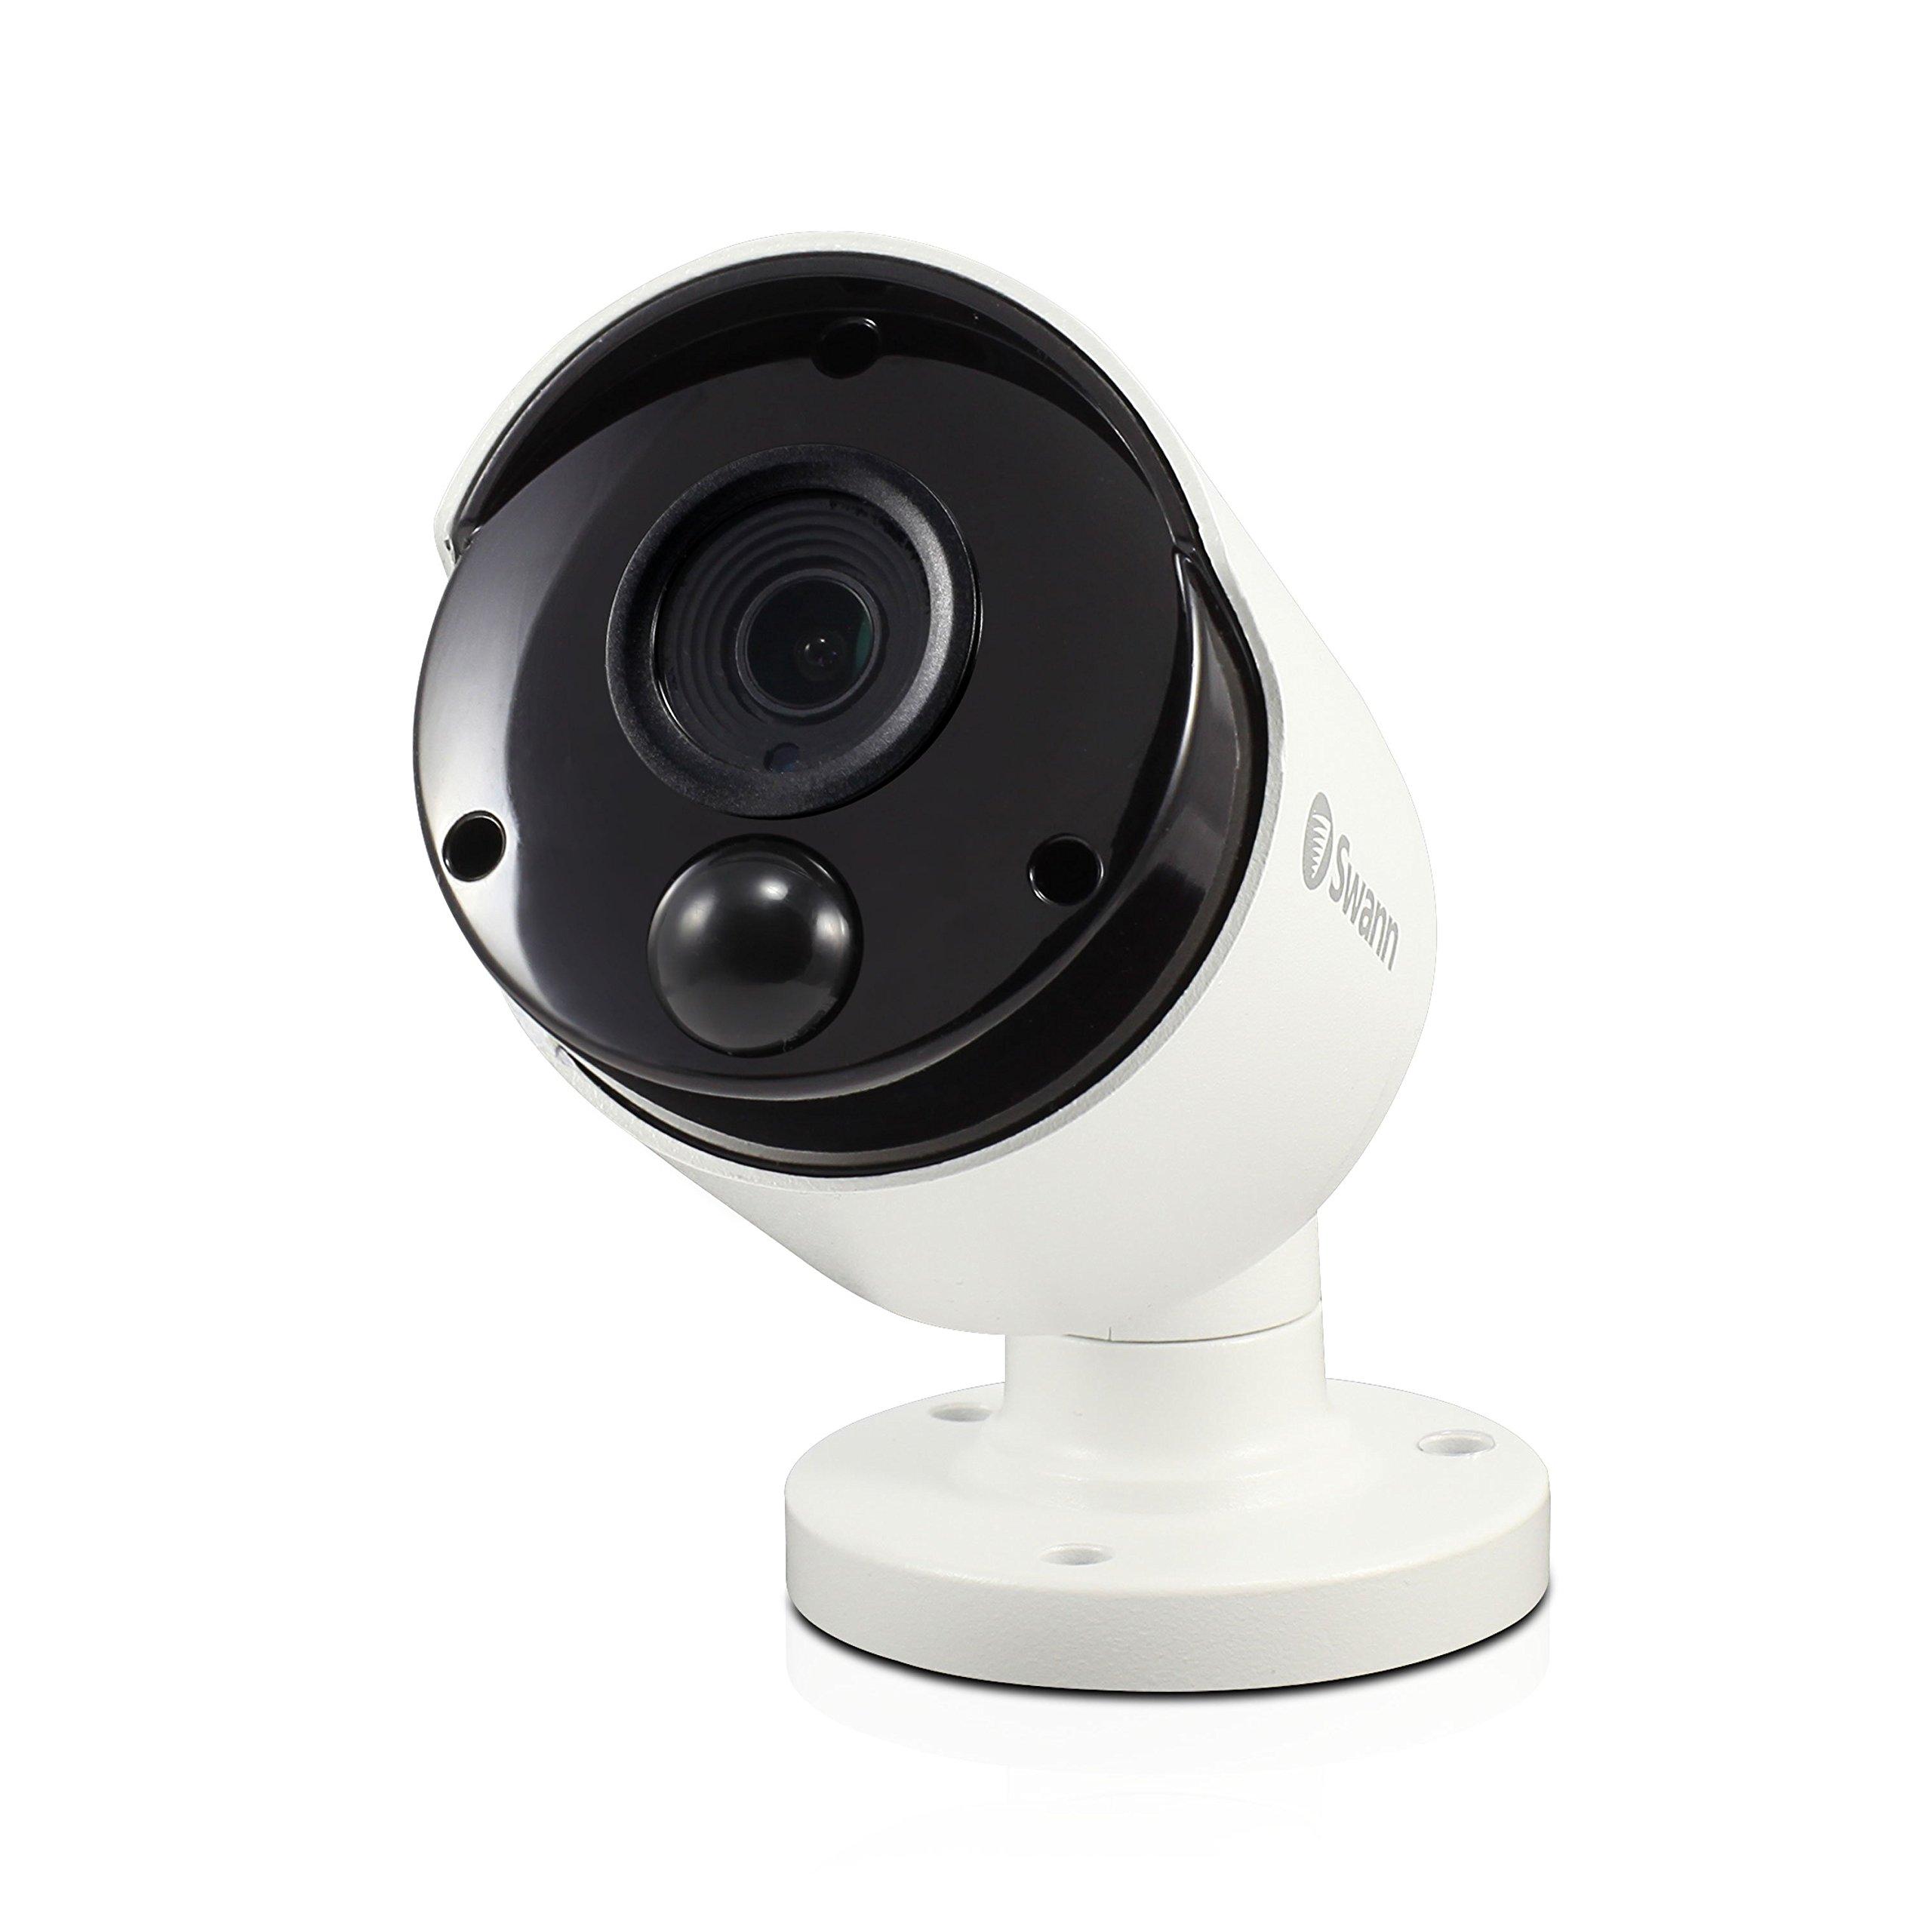 Swann SWPRO-3MPMSB-US 3MP Super HD Thermal Sensing PIR CCTV Security Bullet Camera with IR Night Vision - PRO-3MPMSB by Swann